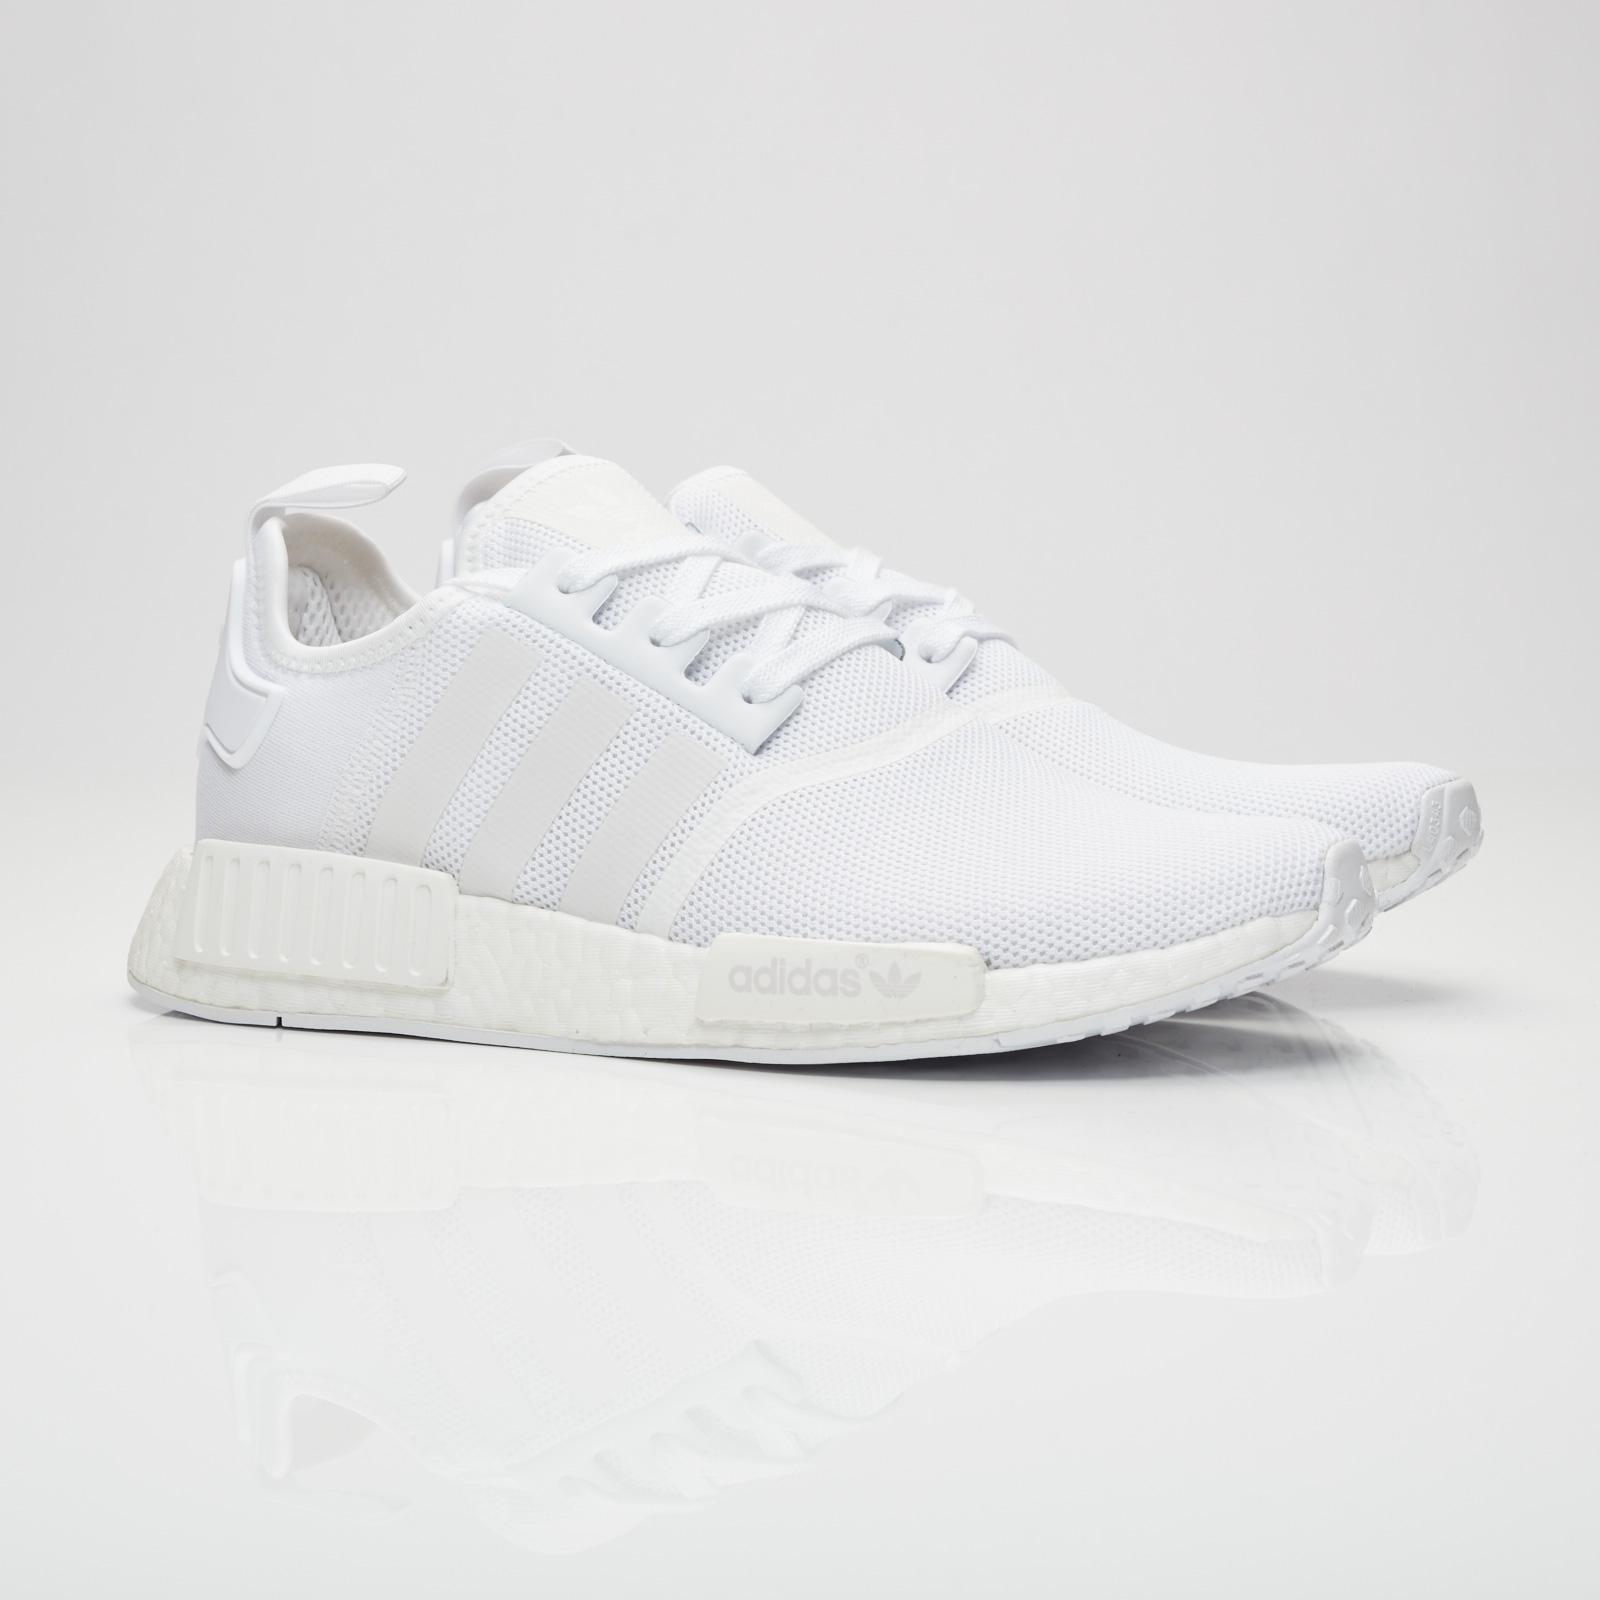 adidas Nmd R1 - Ba7245 - Sneakersnstuff